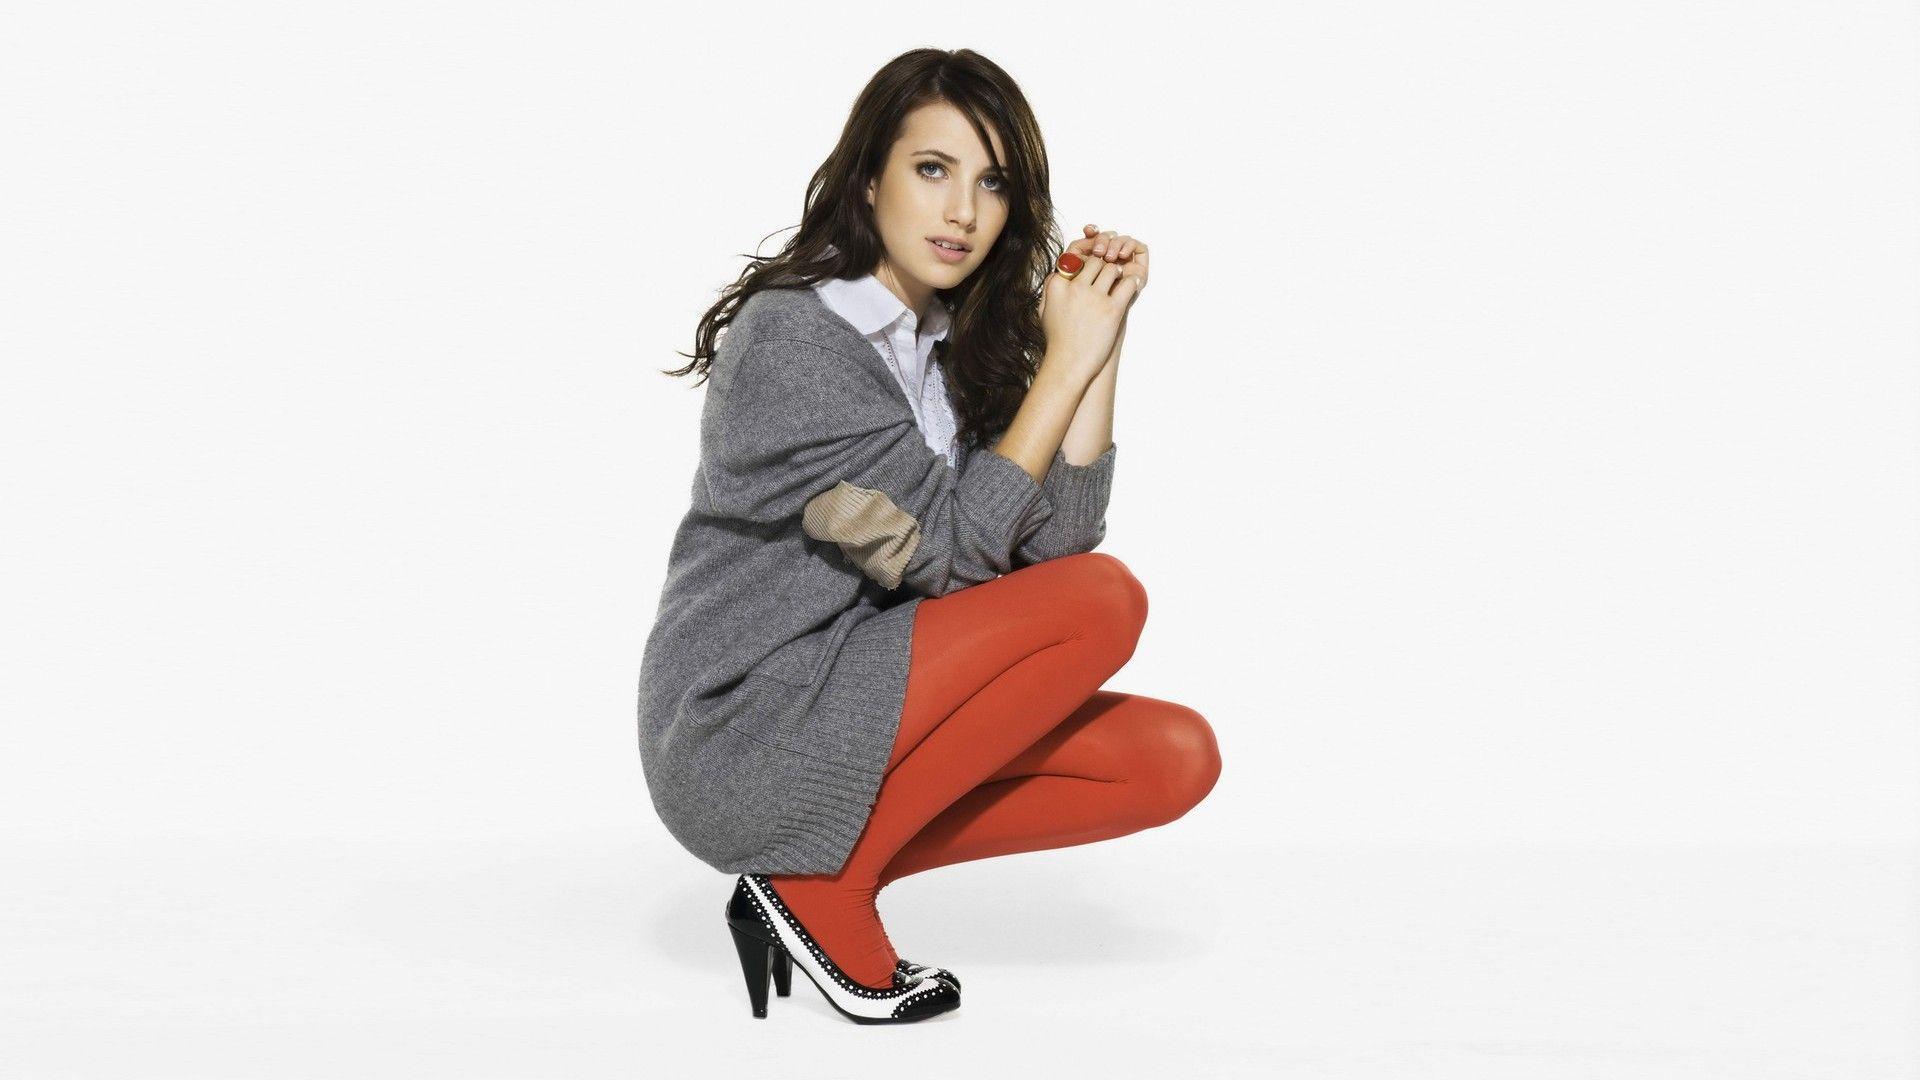 Female Celebrities Wallpapers | 1080p HD Wallpapers Desktop Images ...